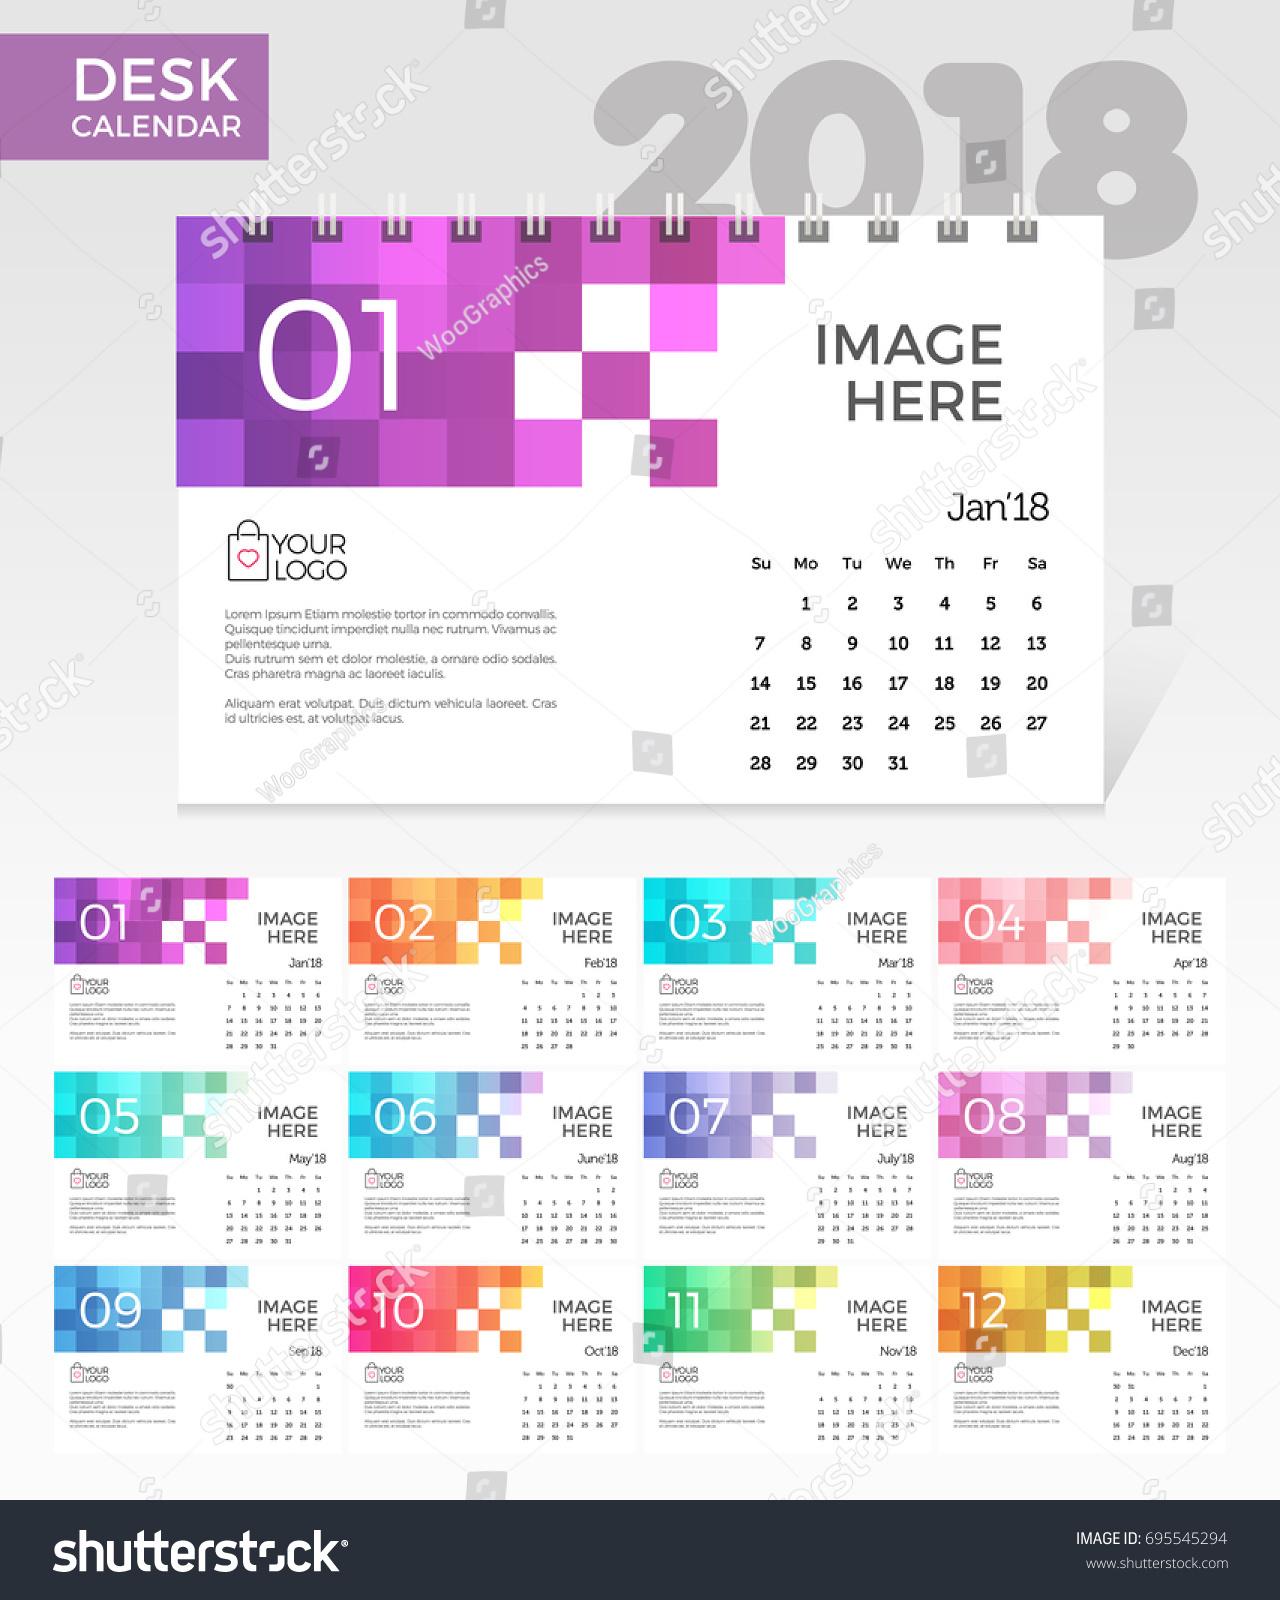 Elegant Desk Calendar Design : Desk calendar simple colorful pixels stock vector